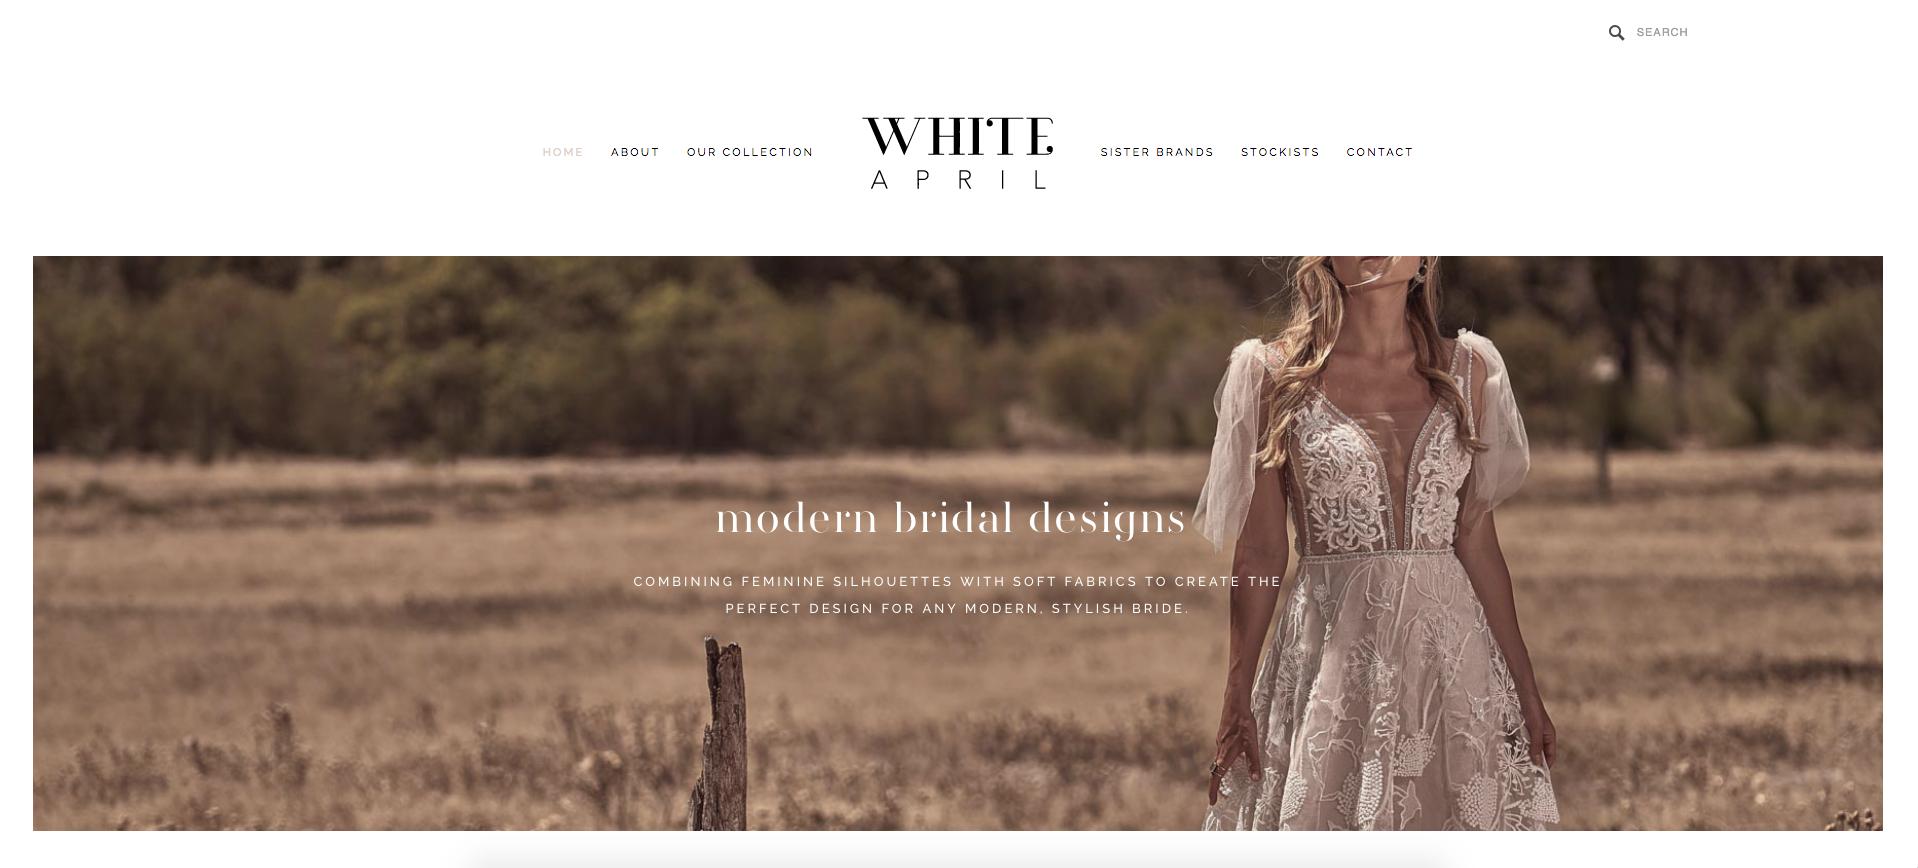 WHITE APRIL  - BRIDAL WEBSITE